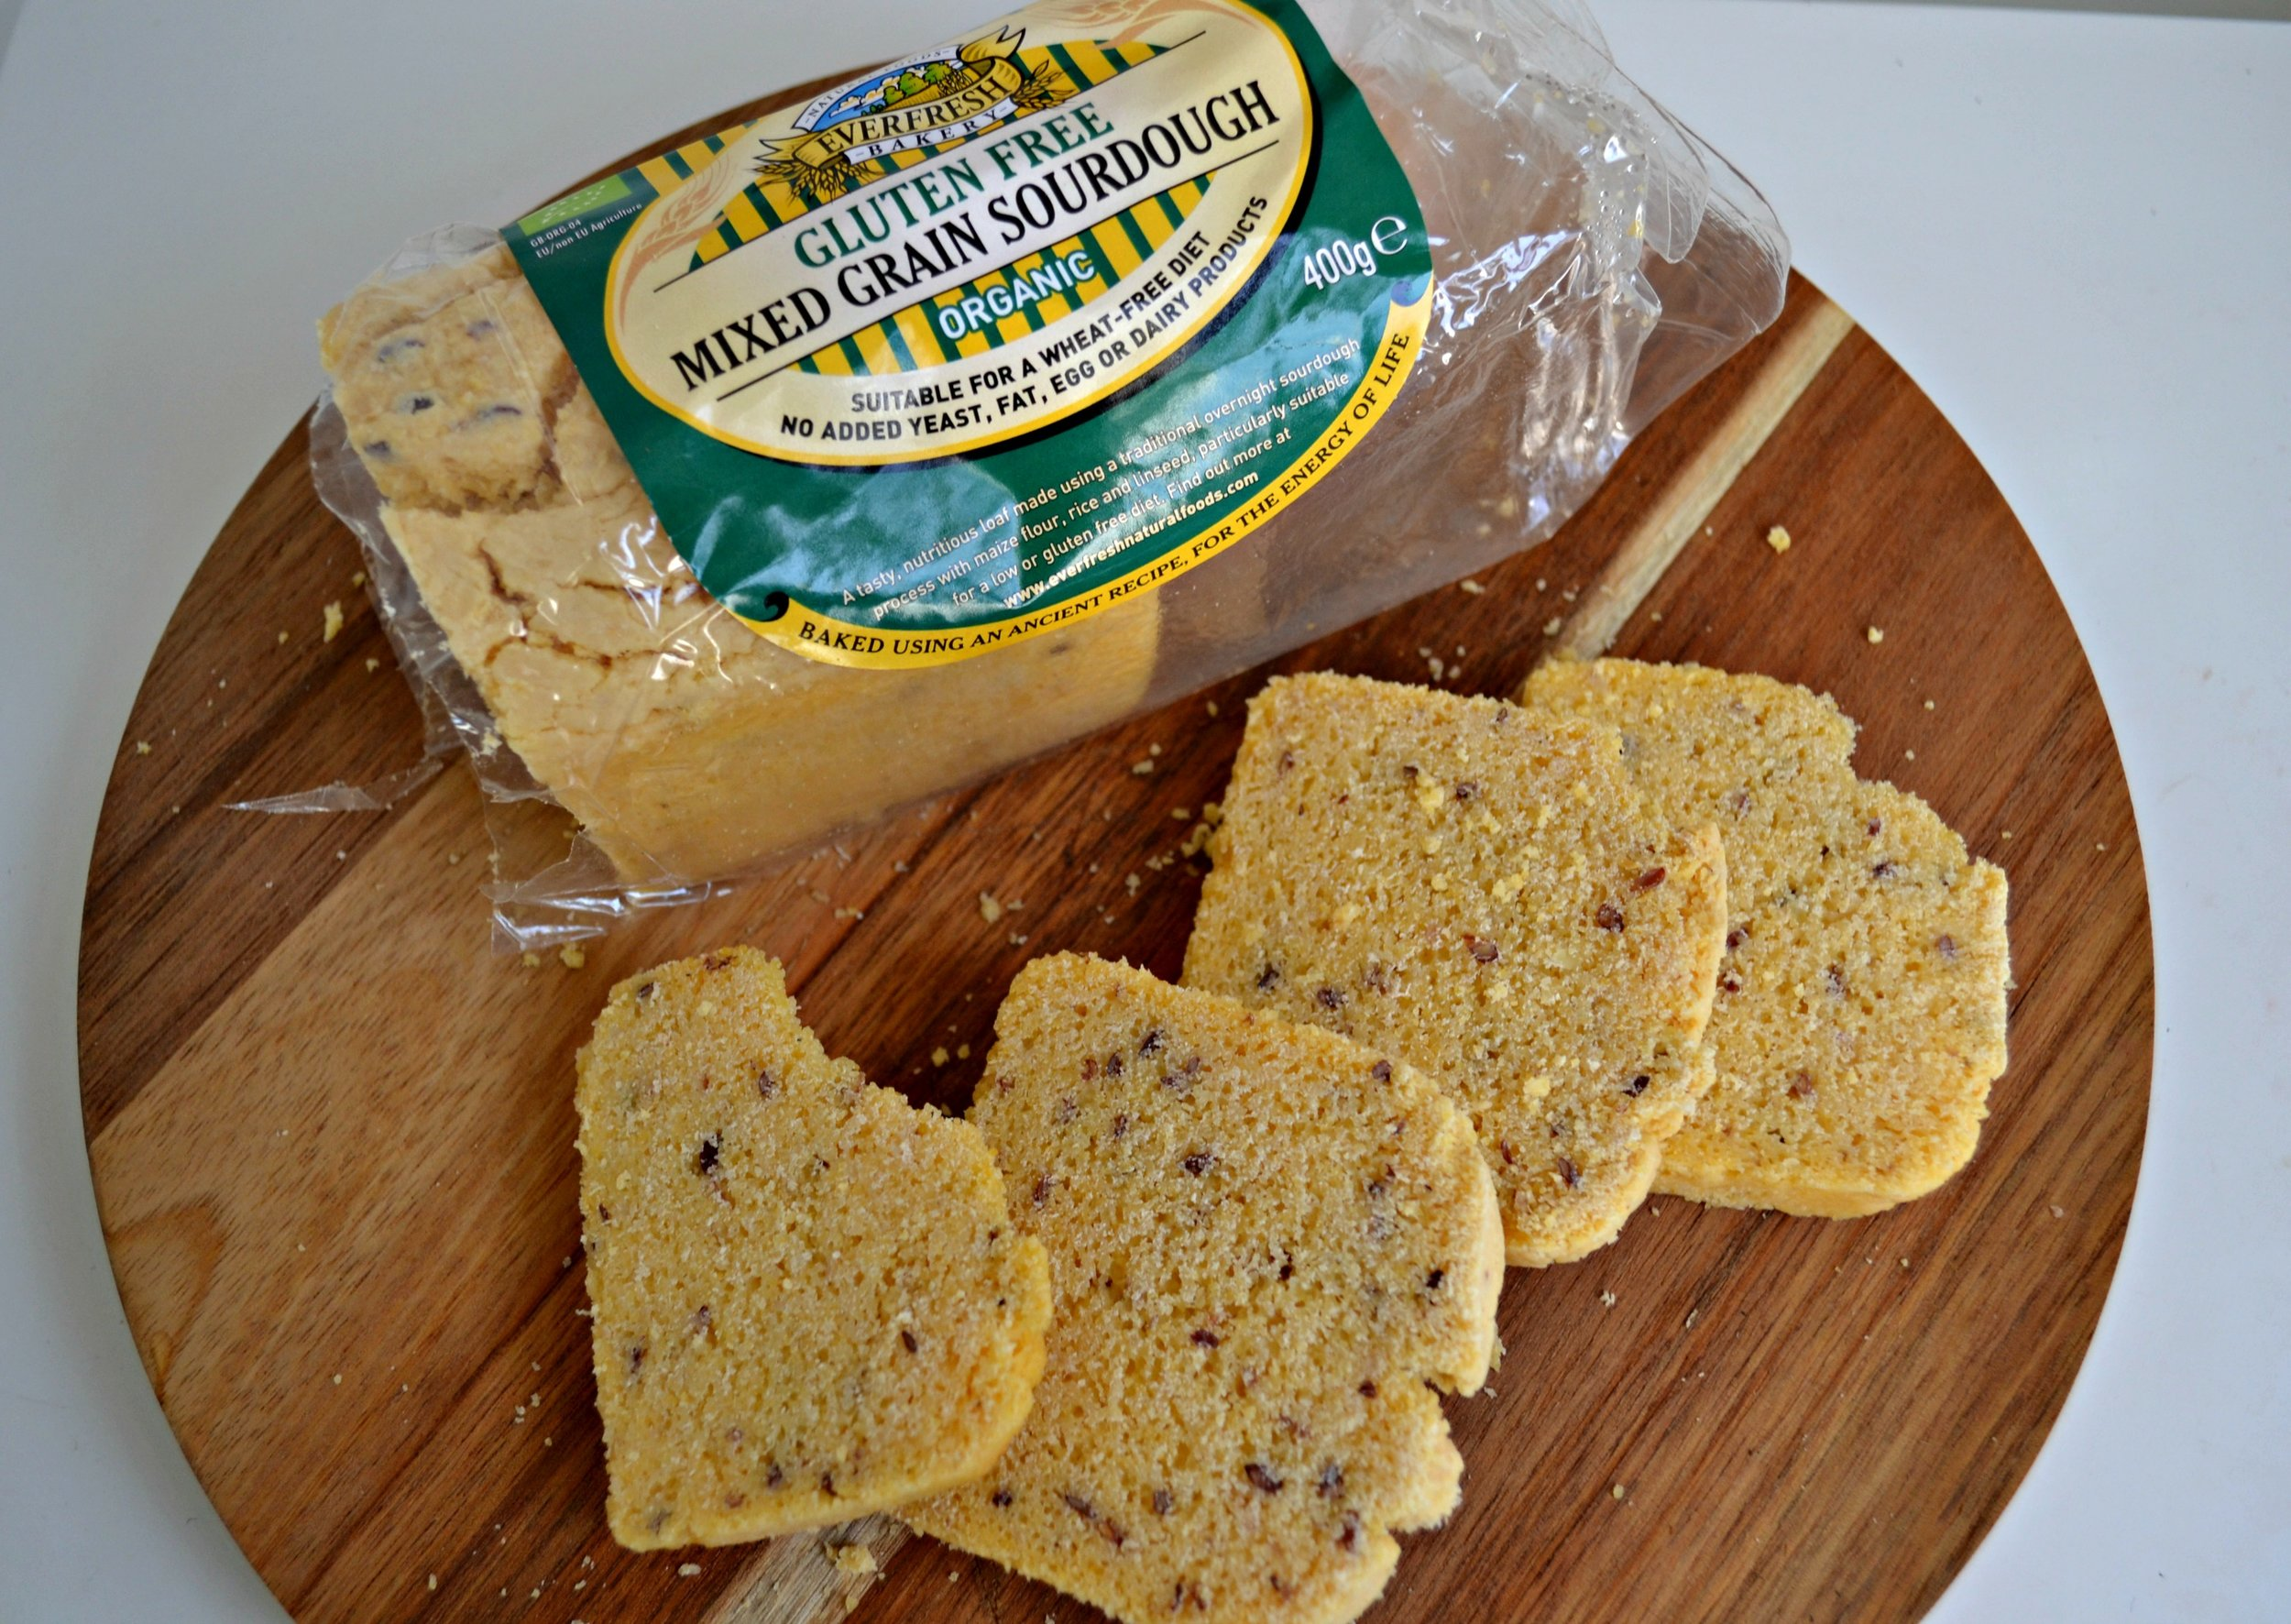 Everfresh Mixed Grain Sourdough   The Flourishing Pantry   yeast free diet blog